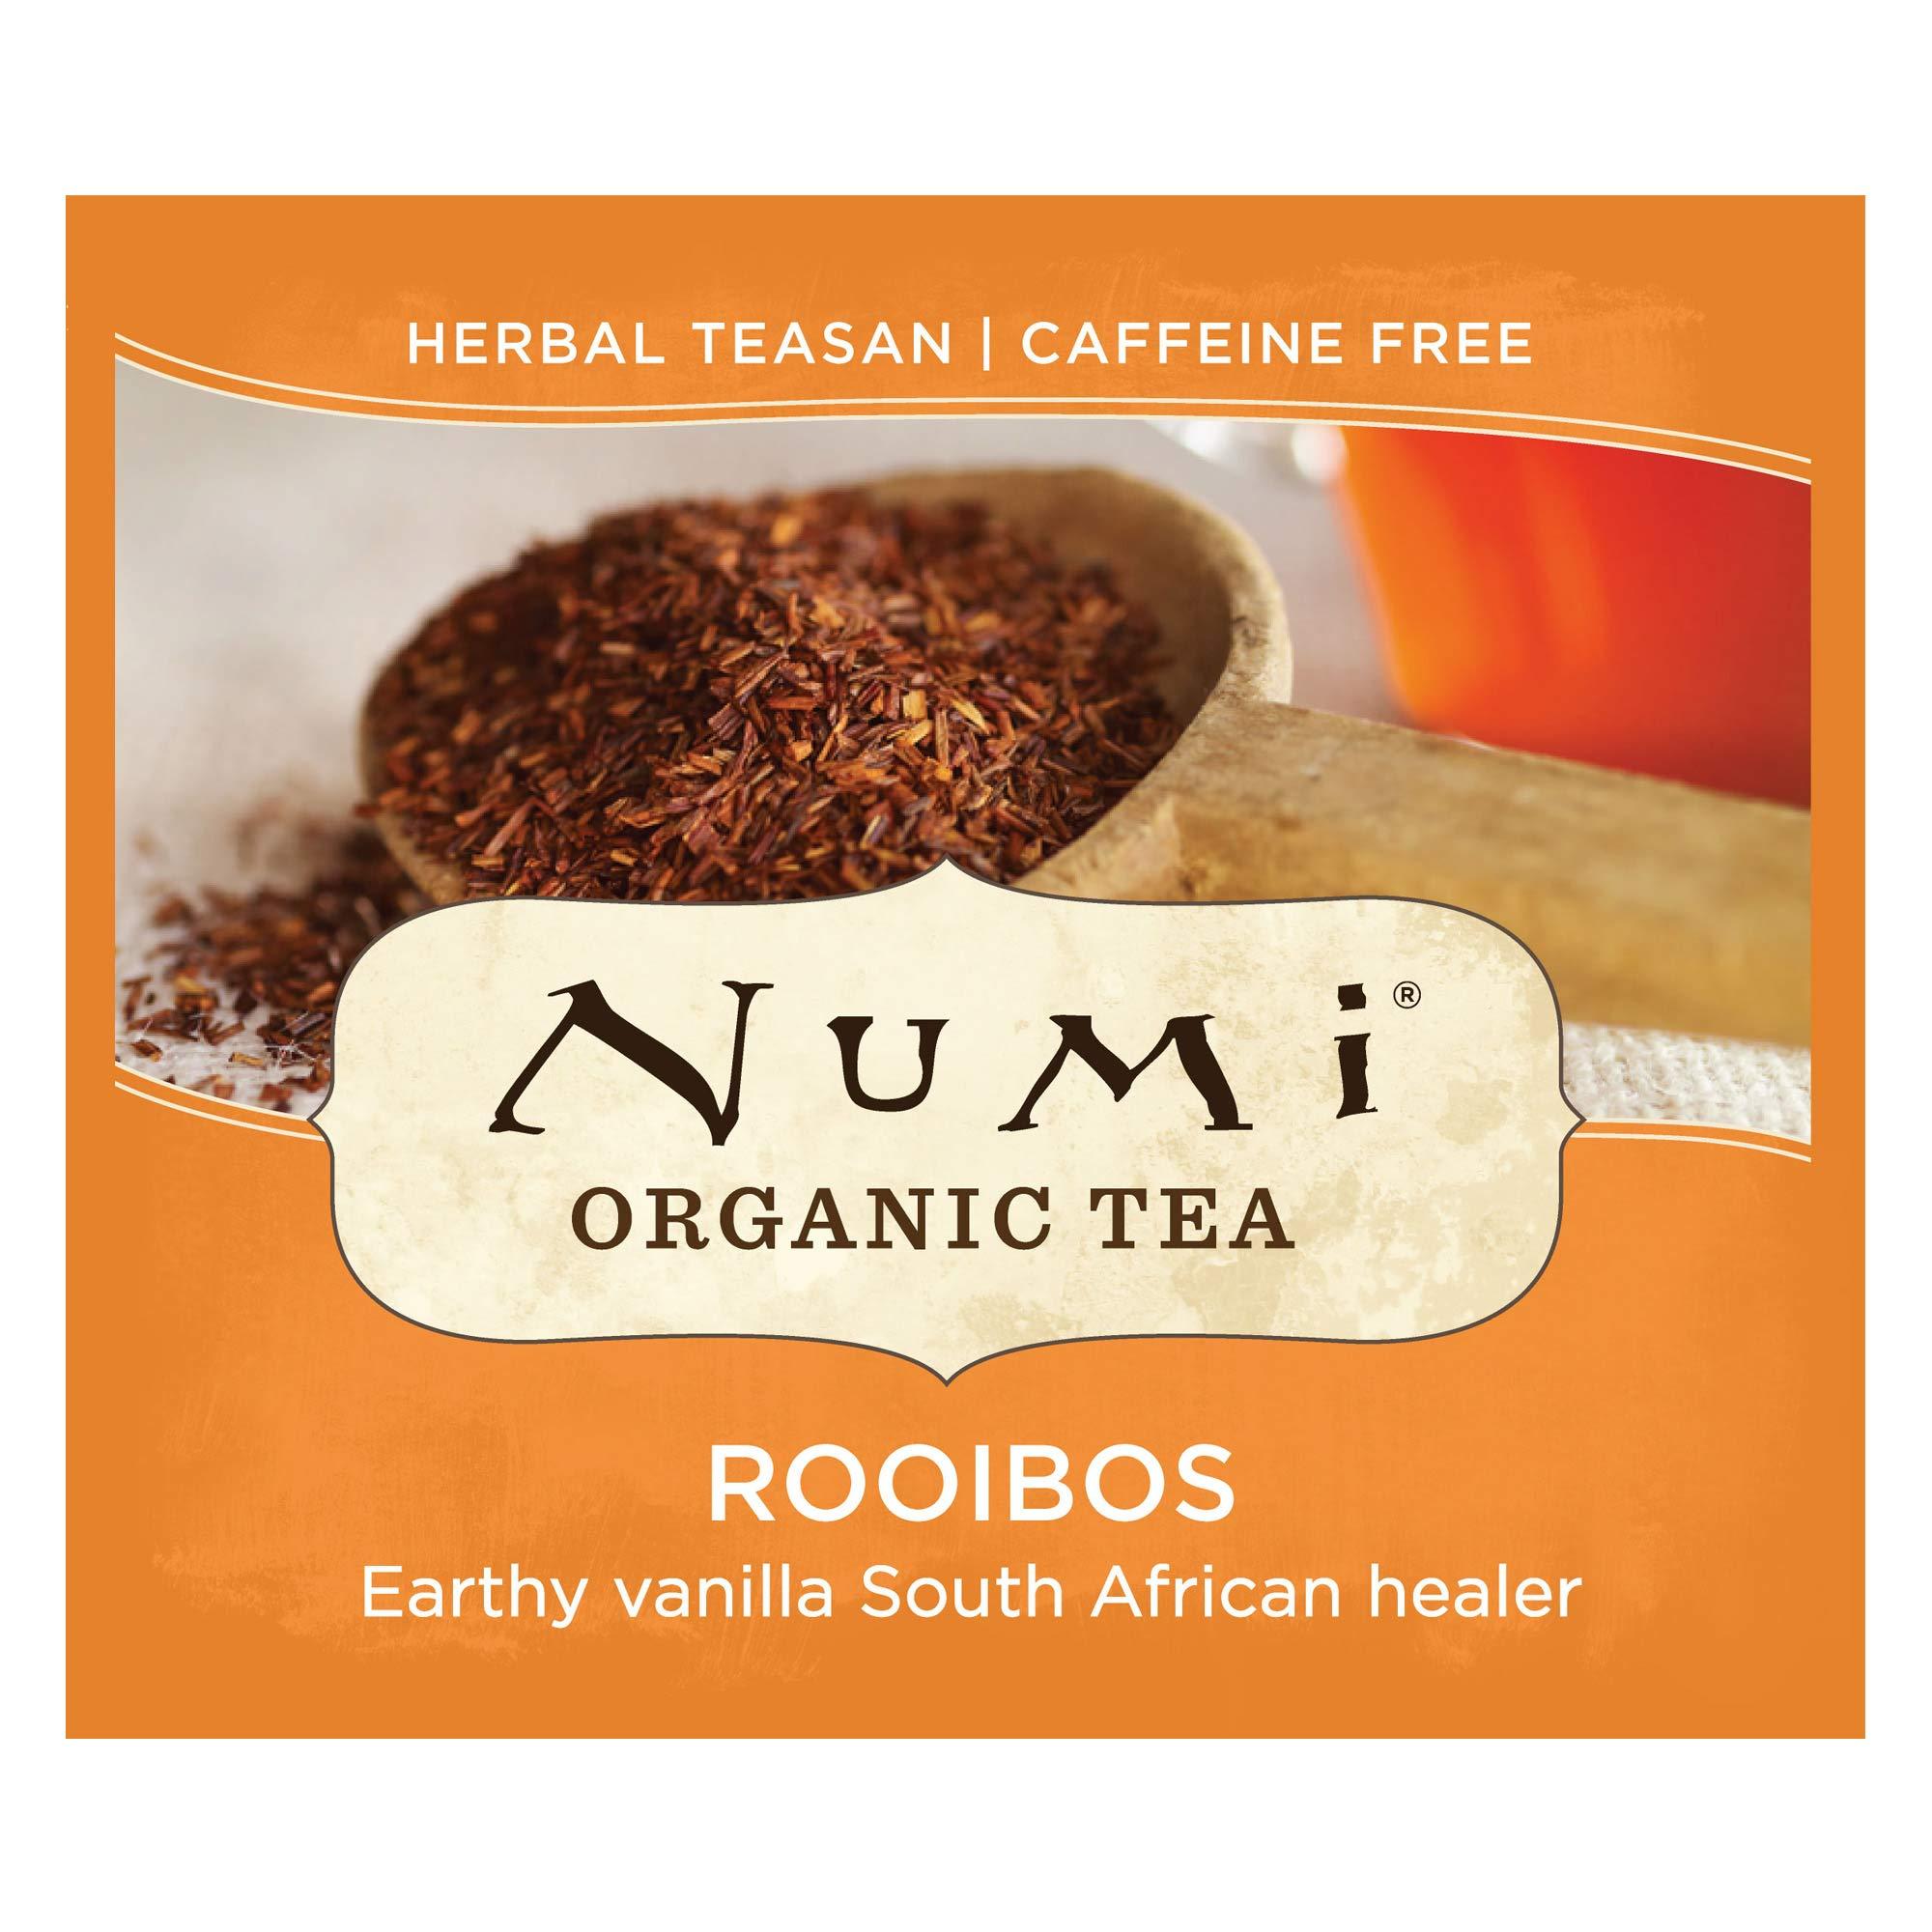 Numi Organic Tea Rooibos, 100 Count Box of Tea Bags, Herbal Teasan (Packaging May Vary) by Numi